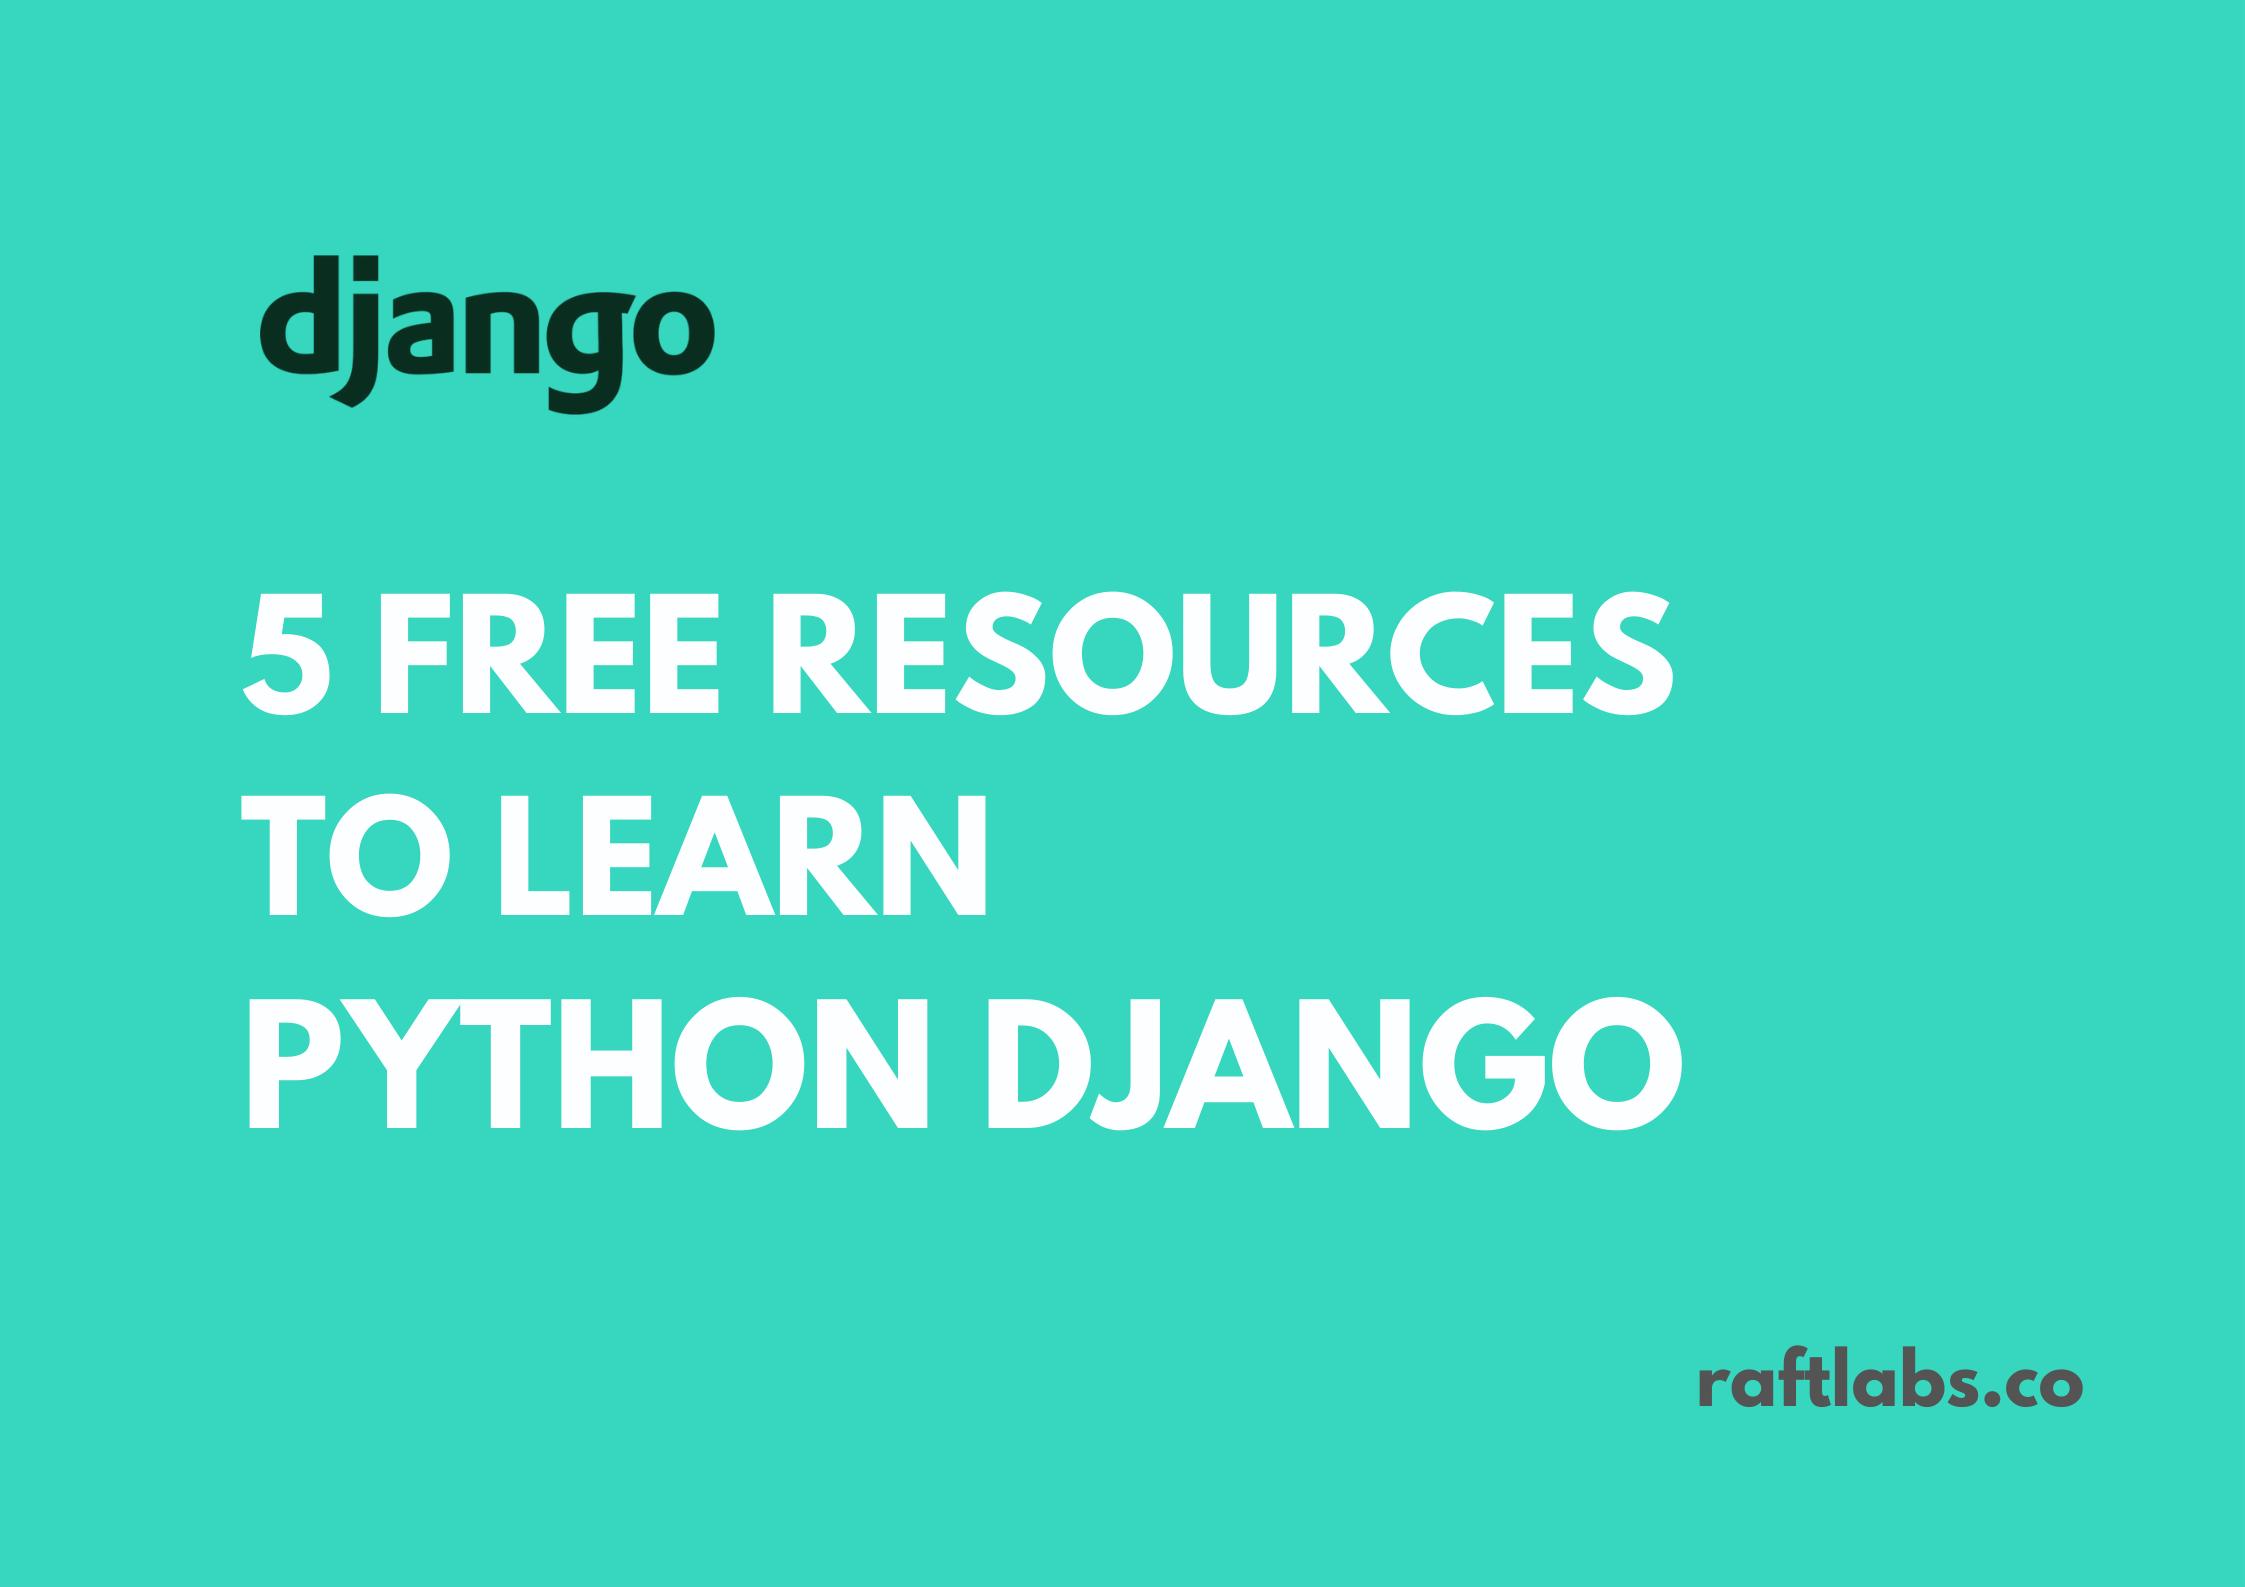 Best 5 Free Resources to learn Django with Django Logo - raftlabs.co